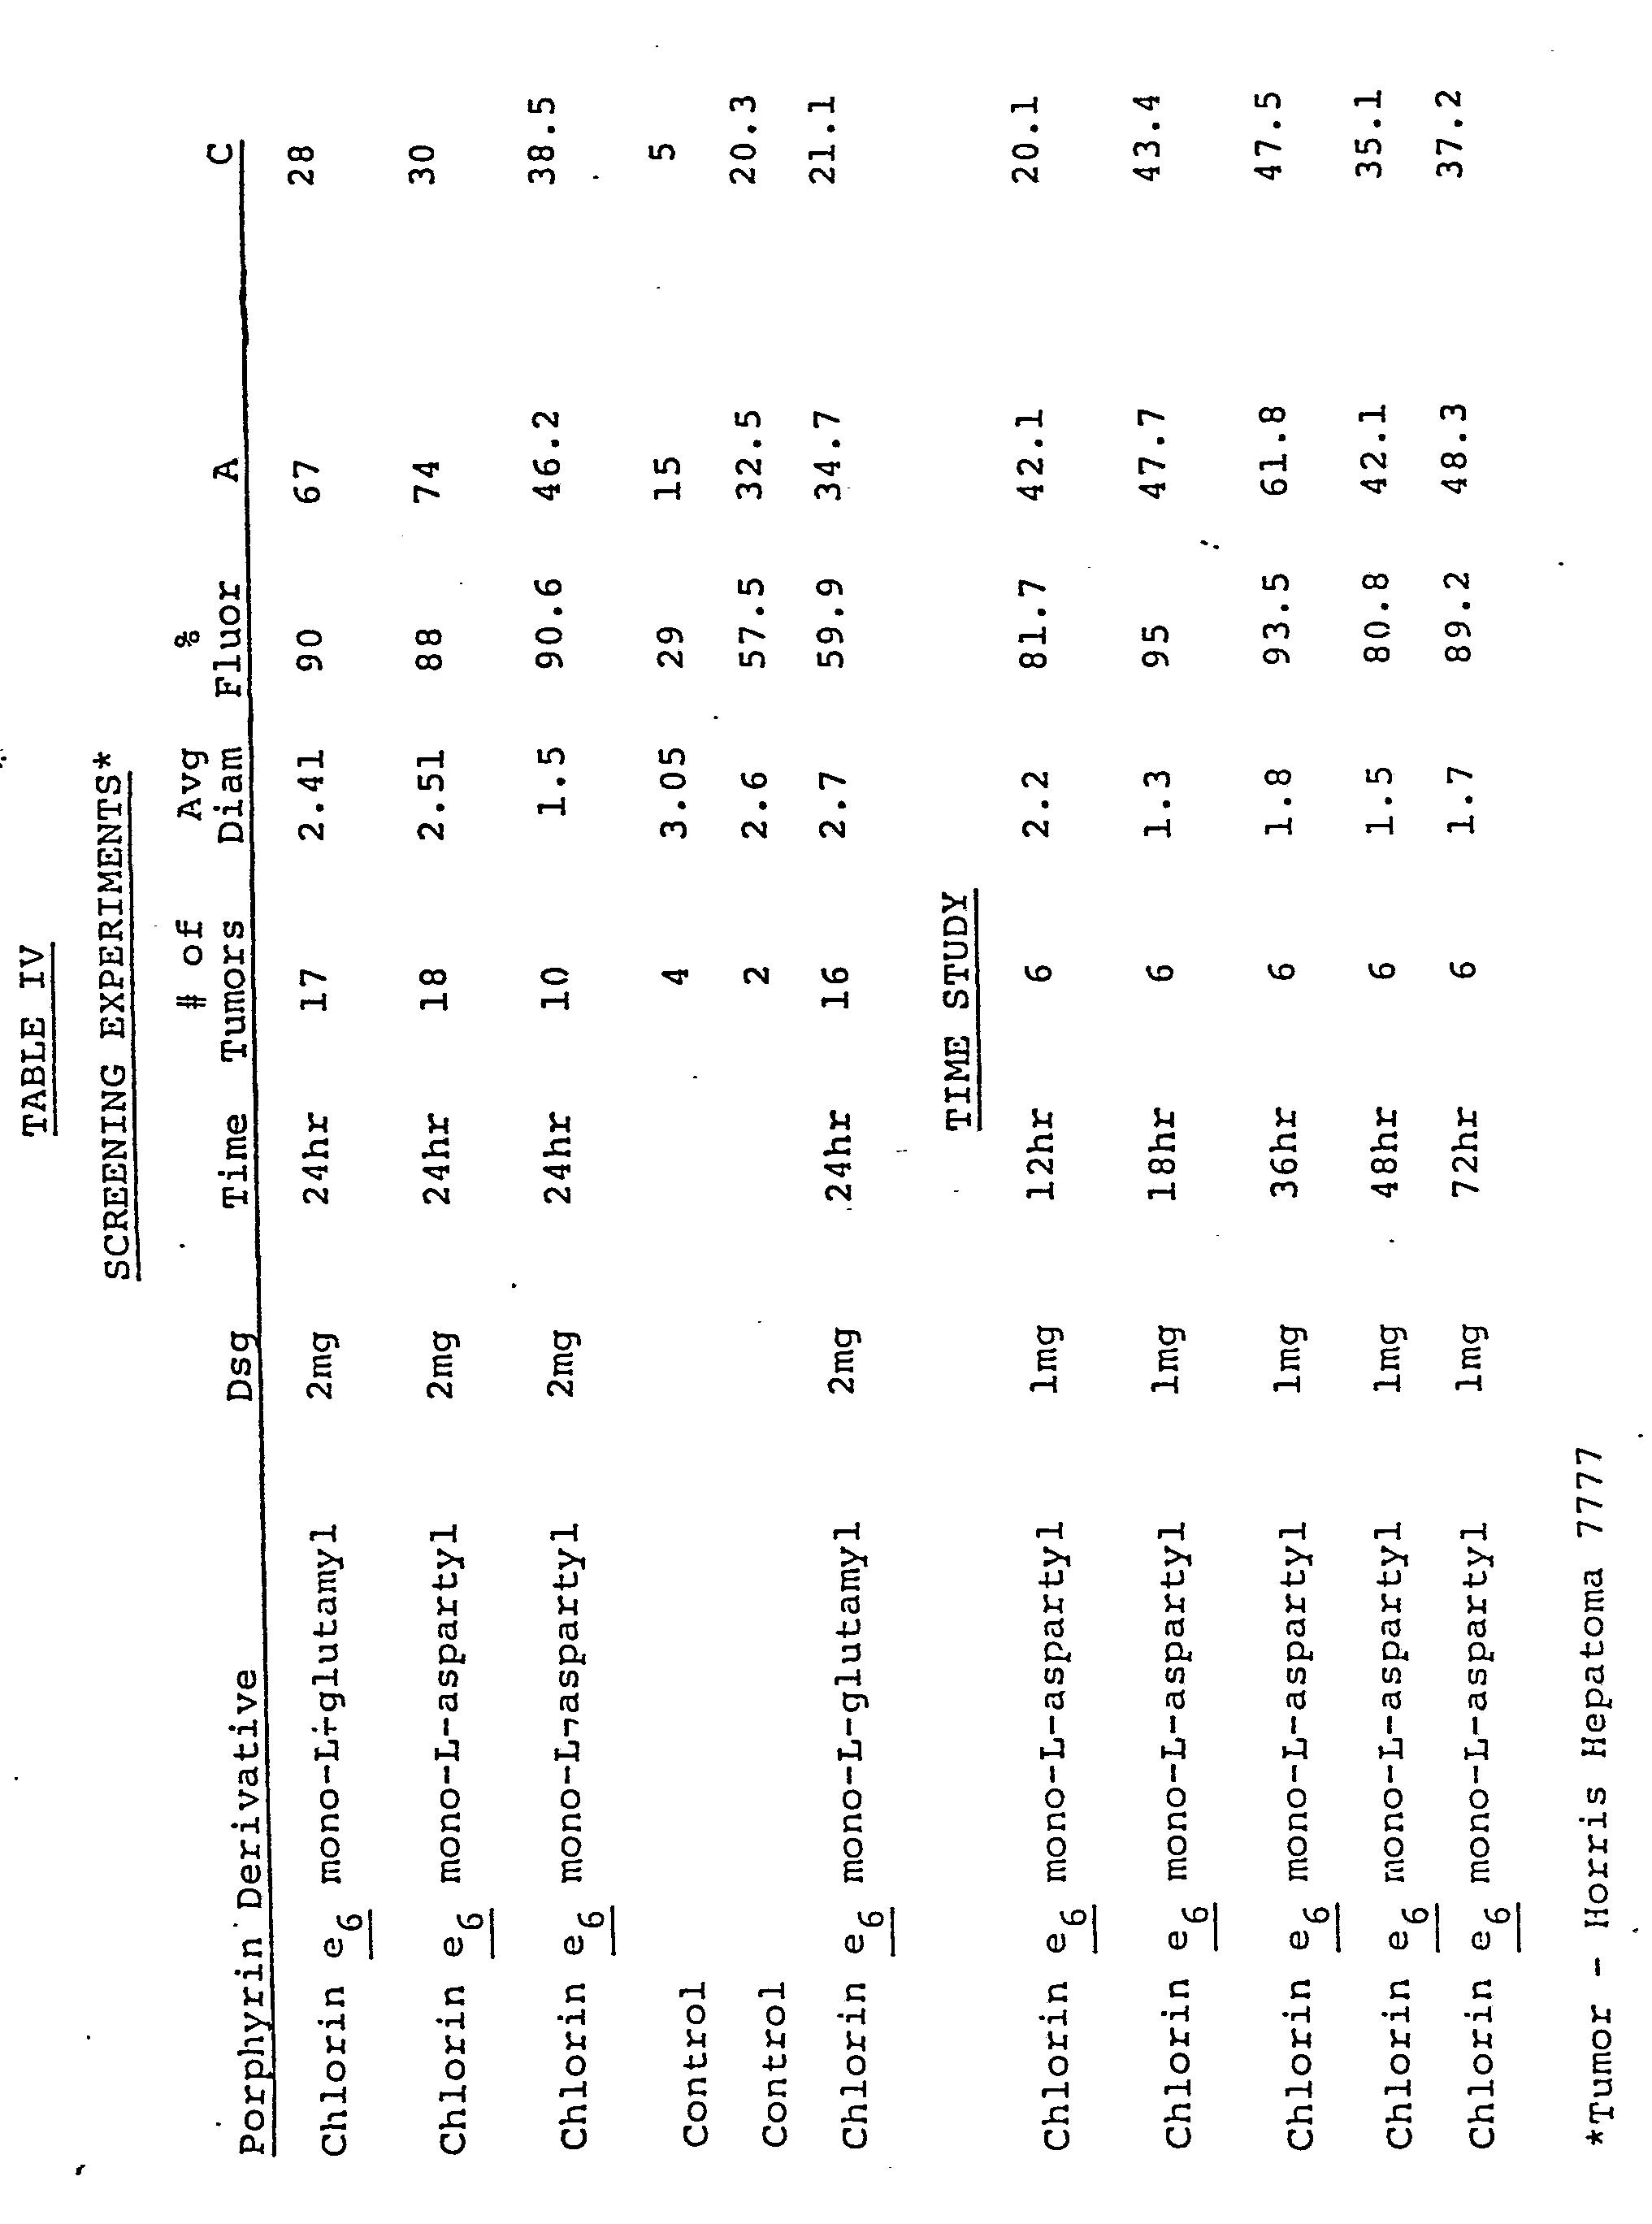 tetrapyrrole compounds T1 - production of tetrapyrrole compounds and vitamin b12 using genetically engineering of propionibacterium freudenreichii an overview au - murooka,yoshikatsu.